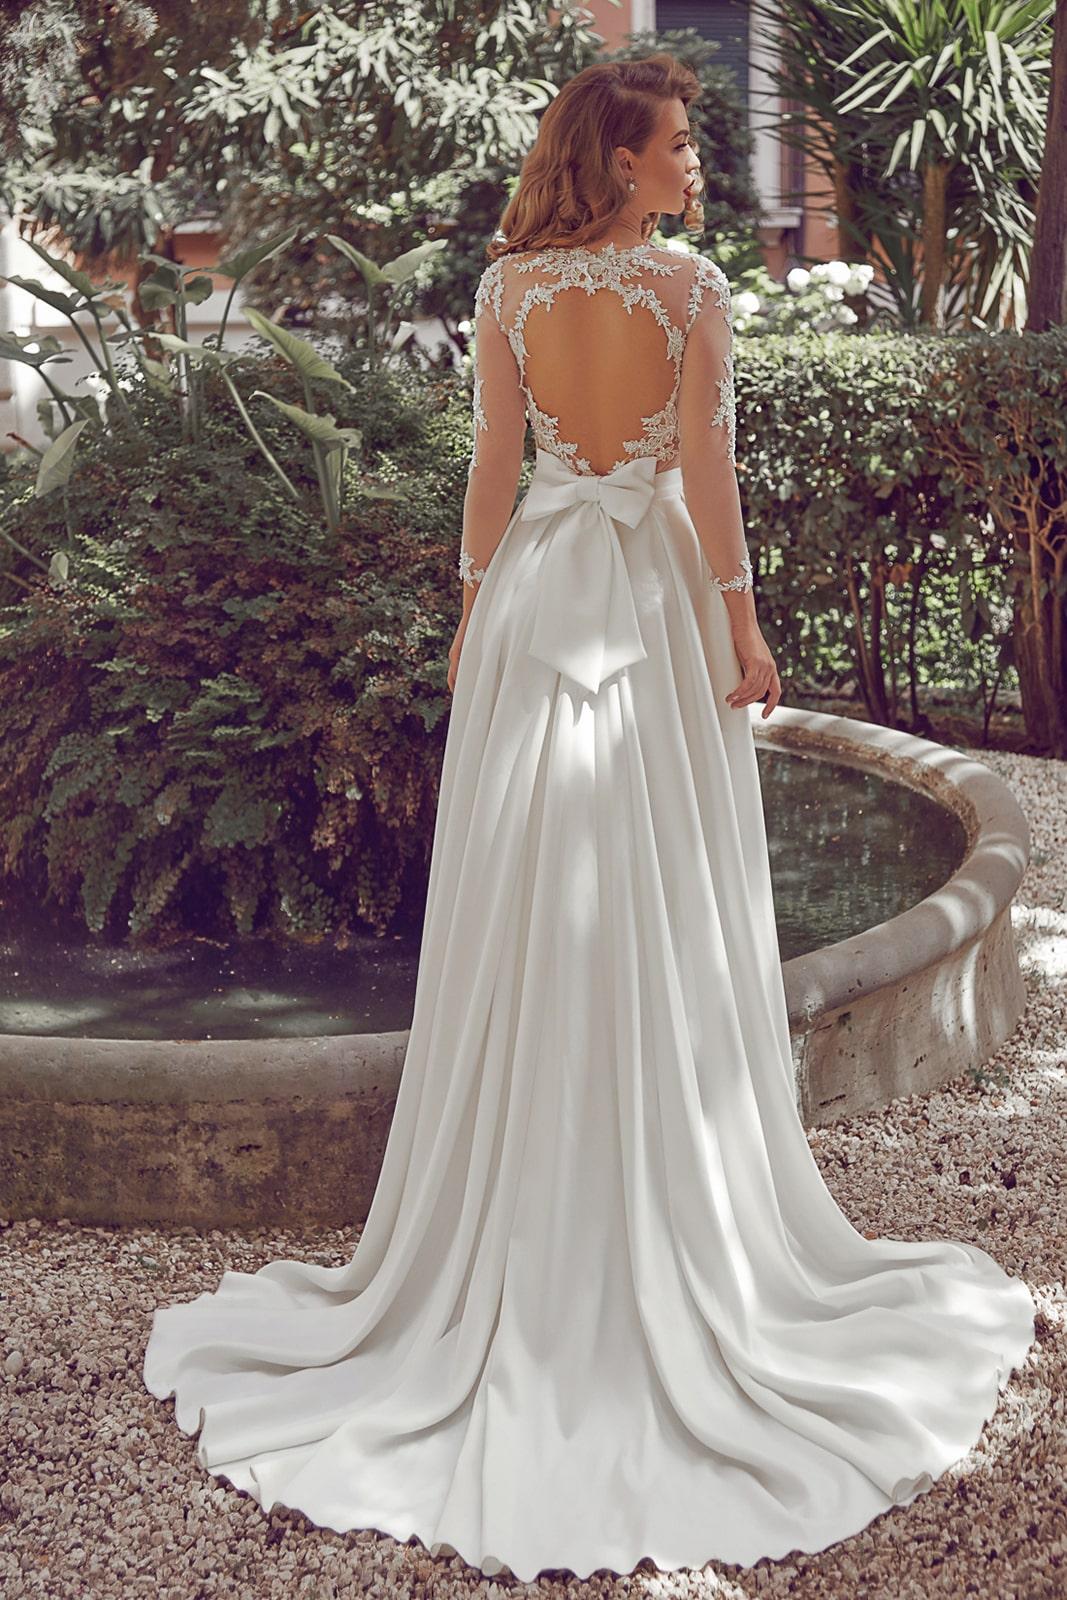 Narnia Model - Colectia Roma - Adora Sposa (3)